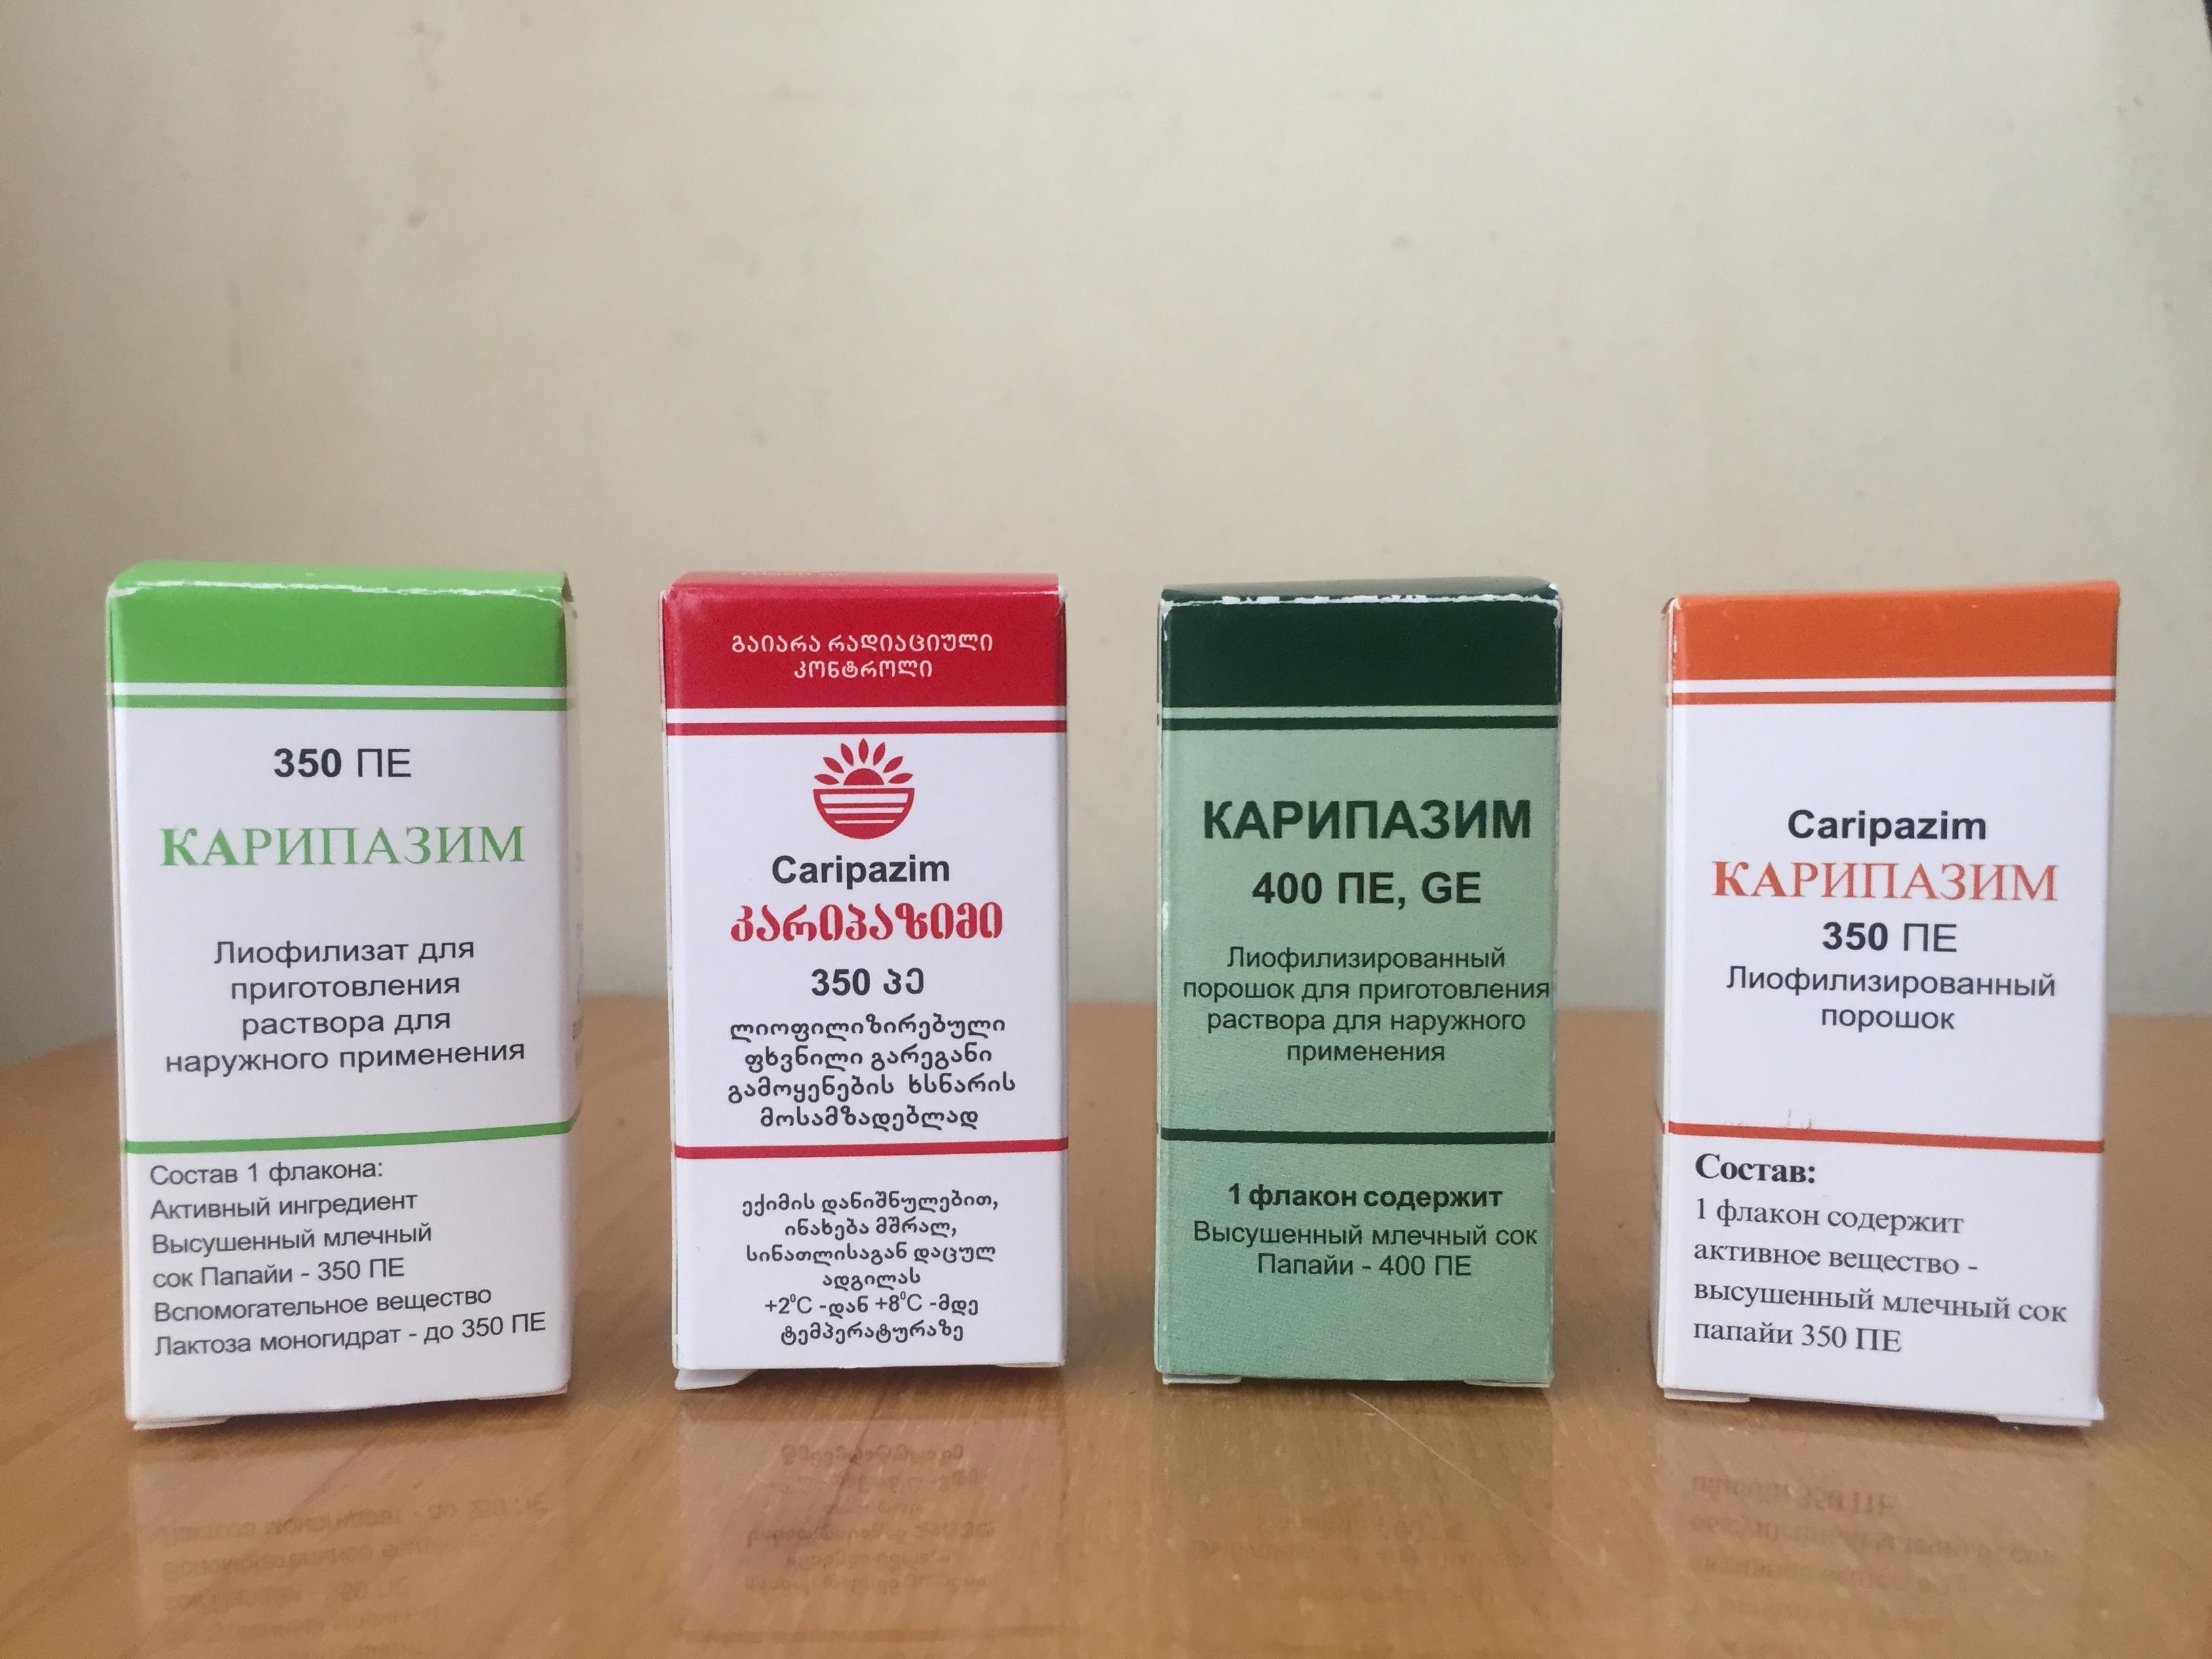 Caripazim® - Ukraine